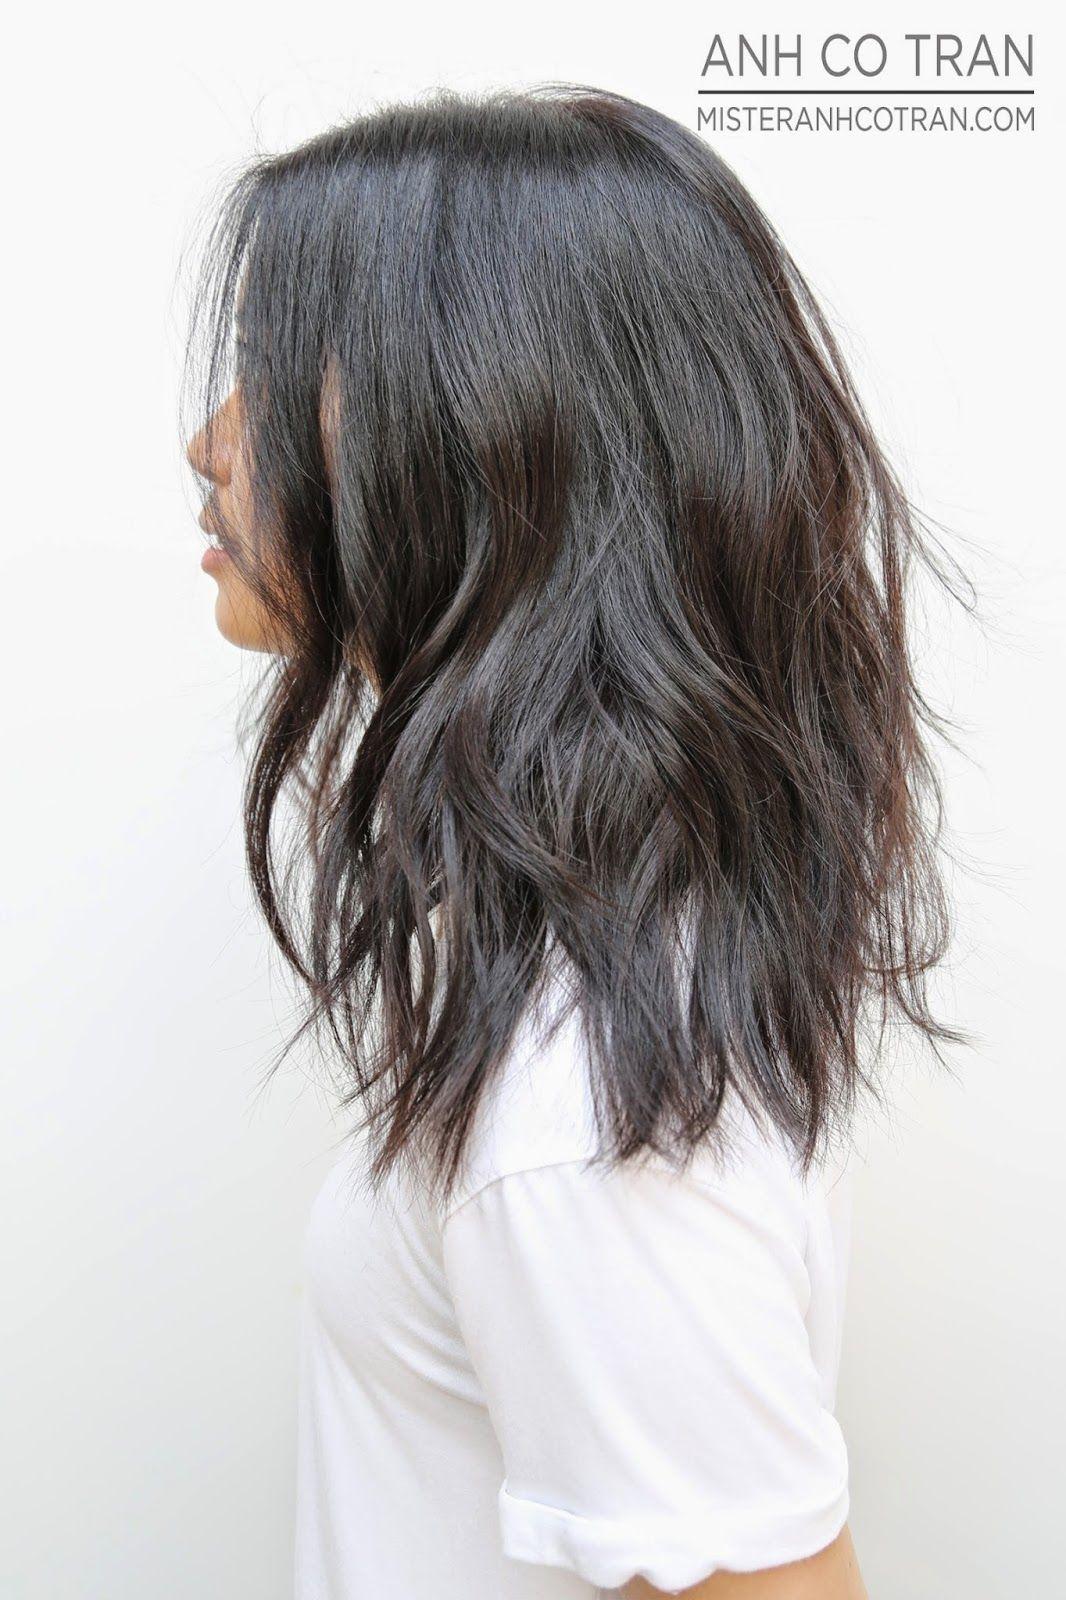 Mister Anhcotran Beautiful Beachy Waves At Ramirez Tran Salon Hair Styles Long Hair Styles Medium Hair Styles